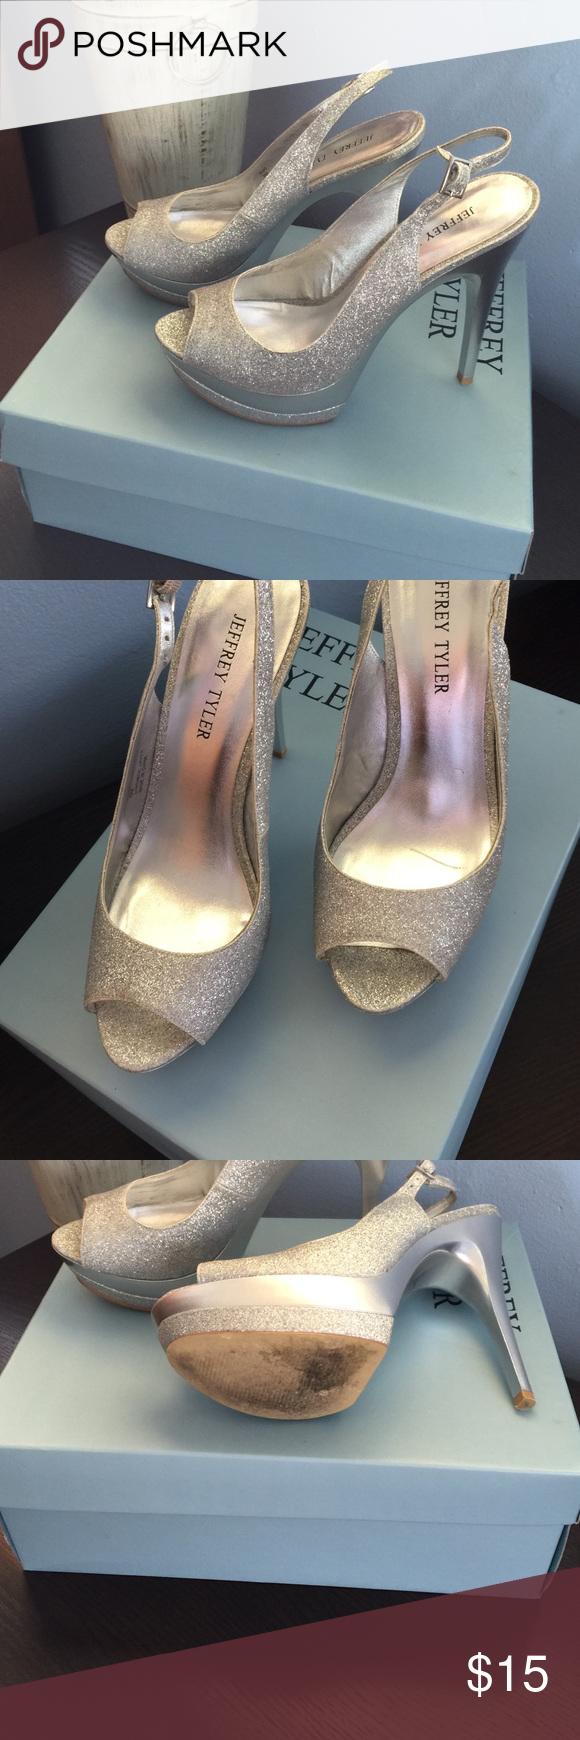 Jeffrey Tyler Silver Platform Pumps Worn once for a wedding around 4 inch heel Jeffrey Tyler Shoes Heels